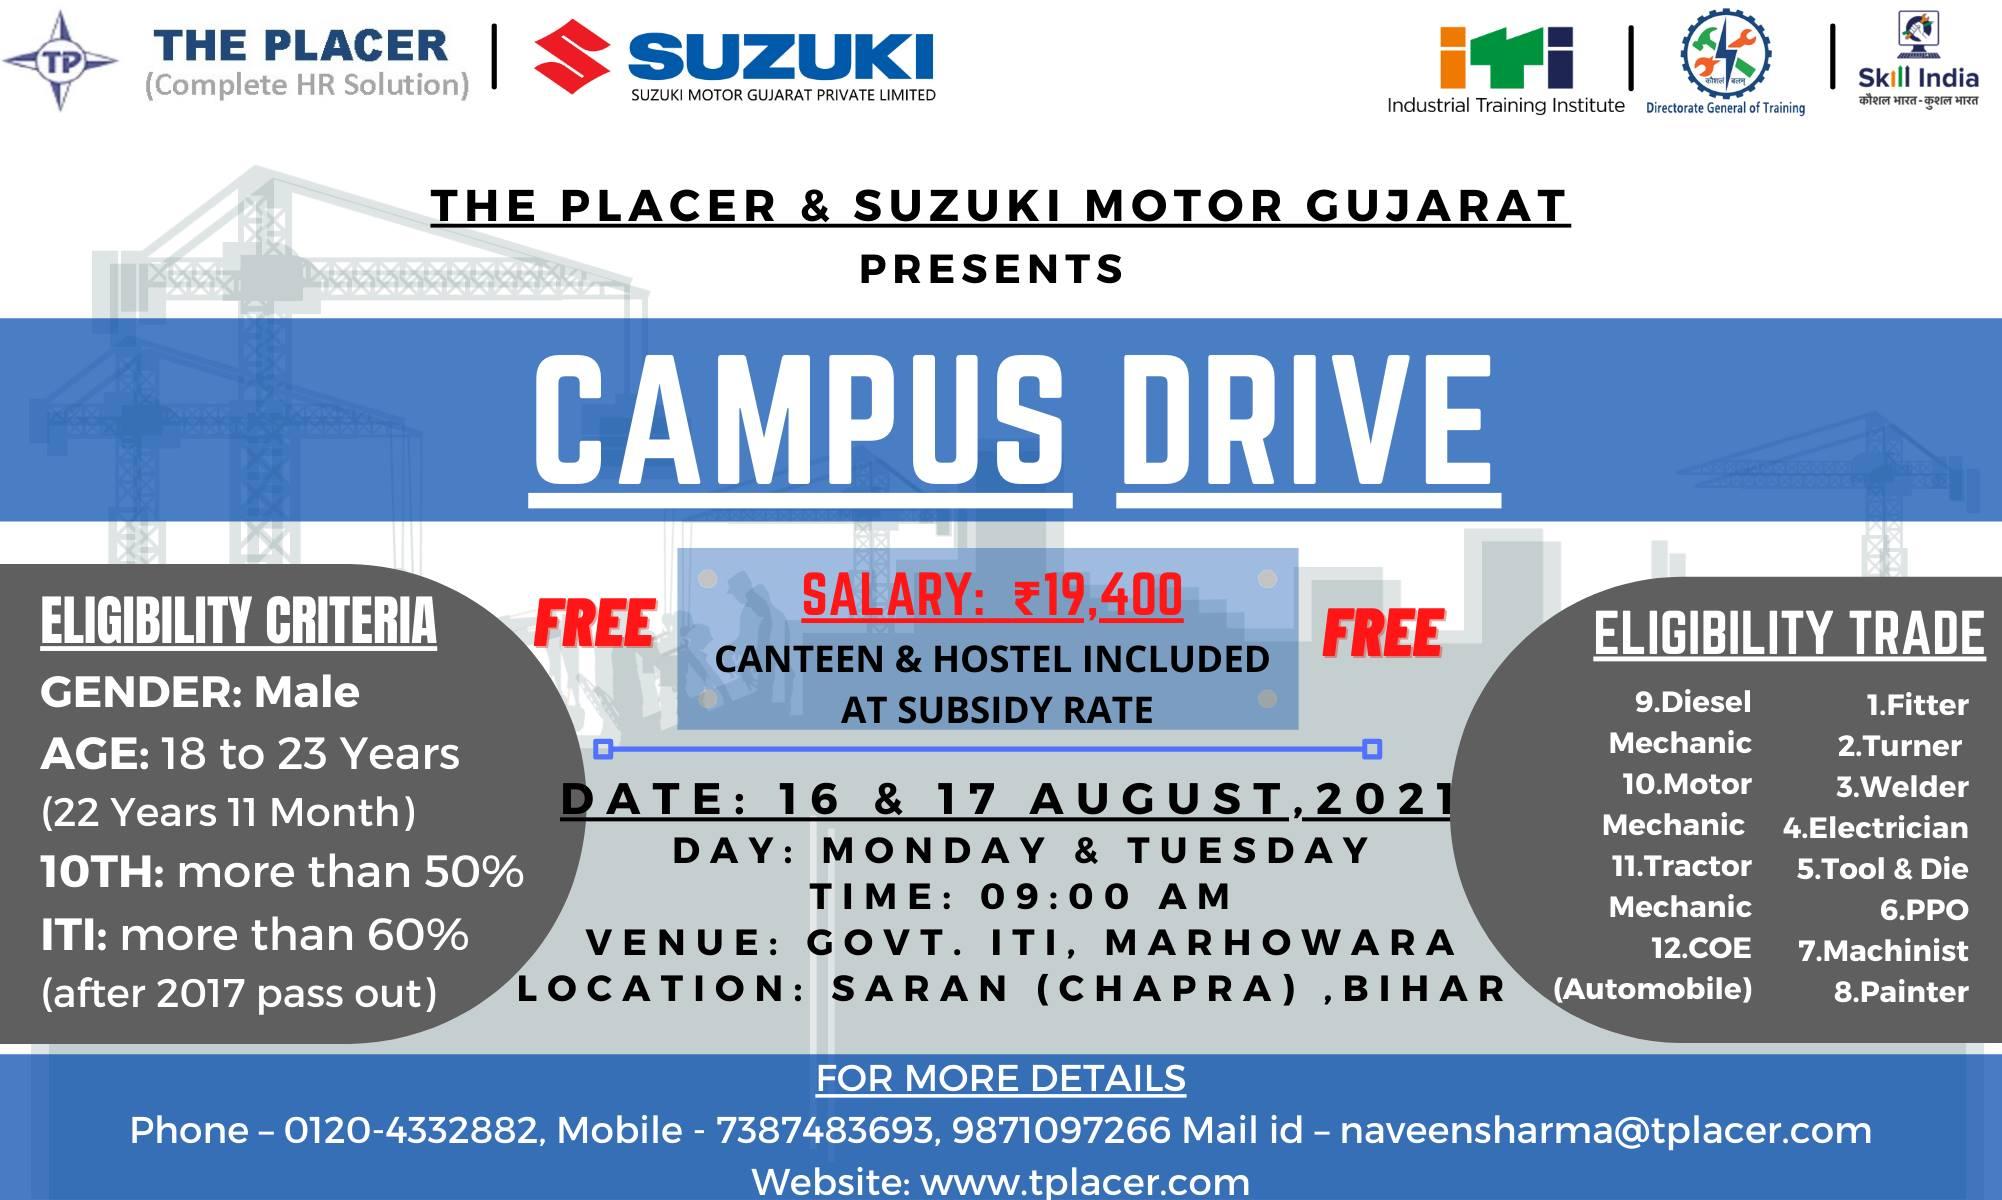 ITI Campus Placement at Pilani, Rajasthan   Jaipur, Rajasthan    Jhunjhunu, Rajasthan   Chappra, Bihar    Suzuki Motor